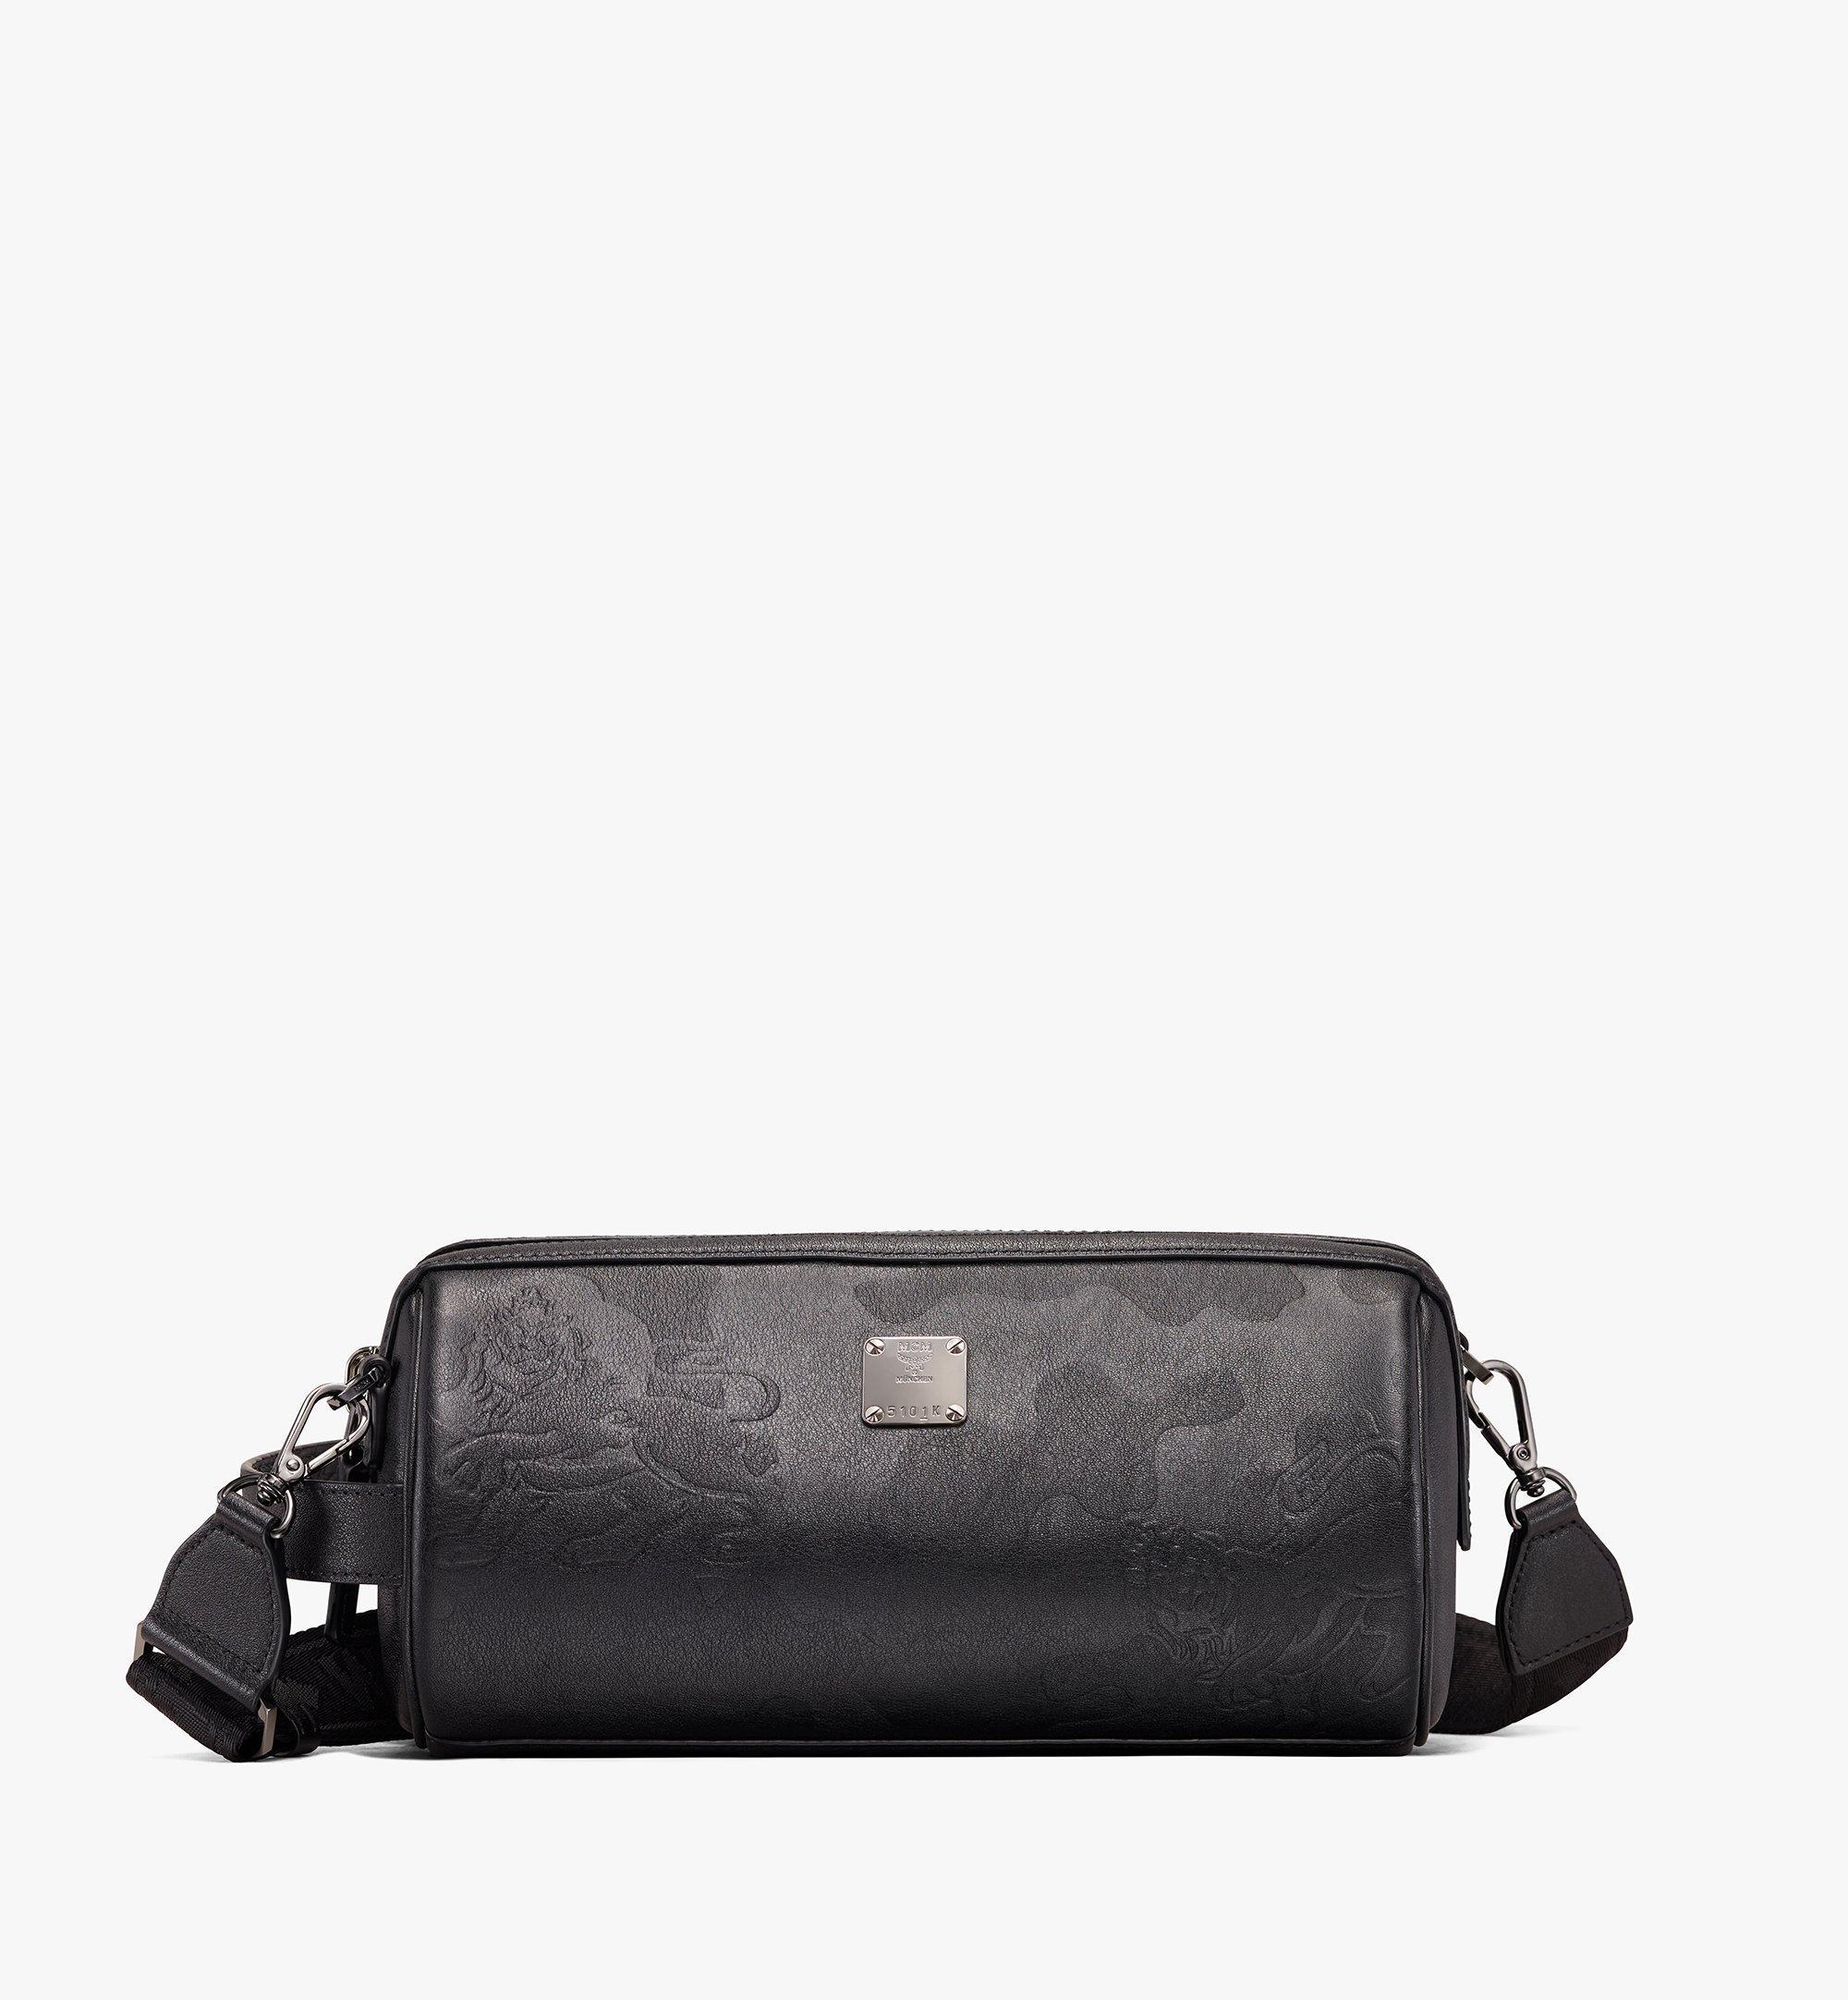 MCM Crossbody Bag in Embossed Lion Camo Black MUR9AES02BK001 Alternate View 1